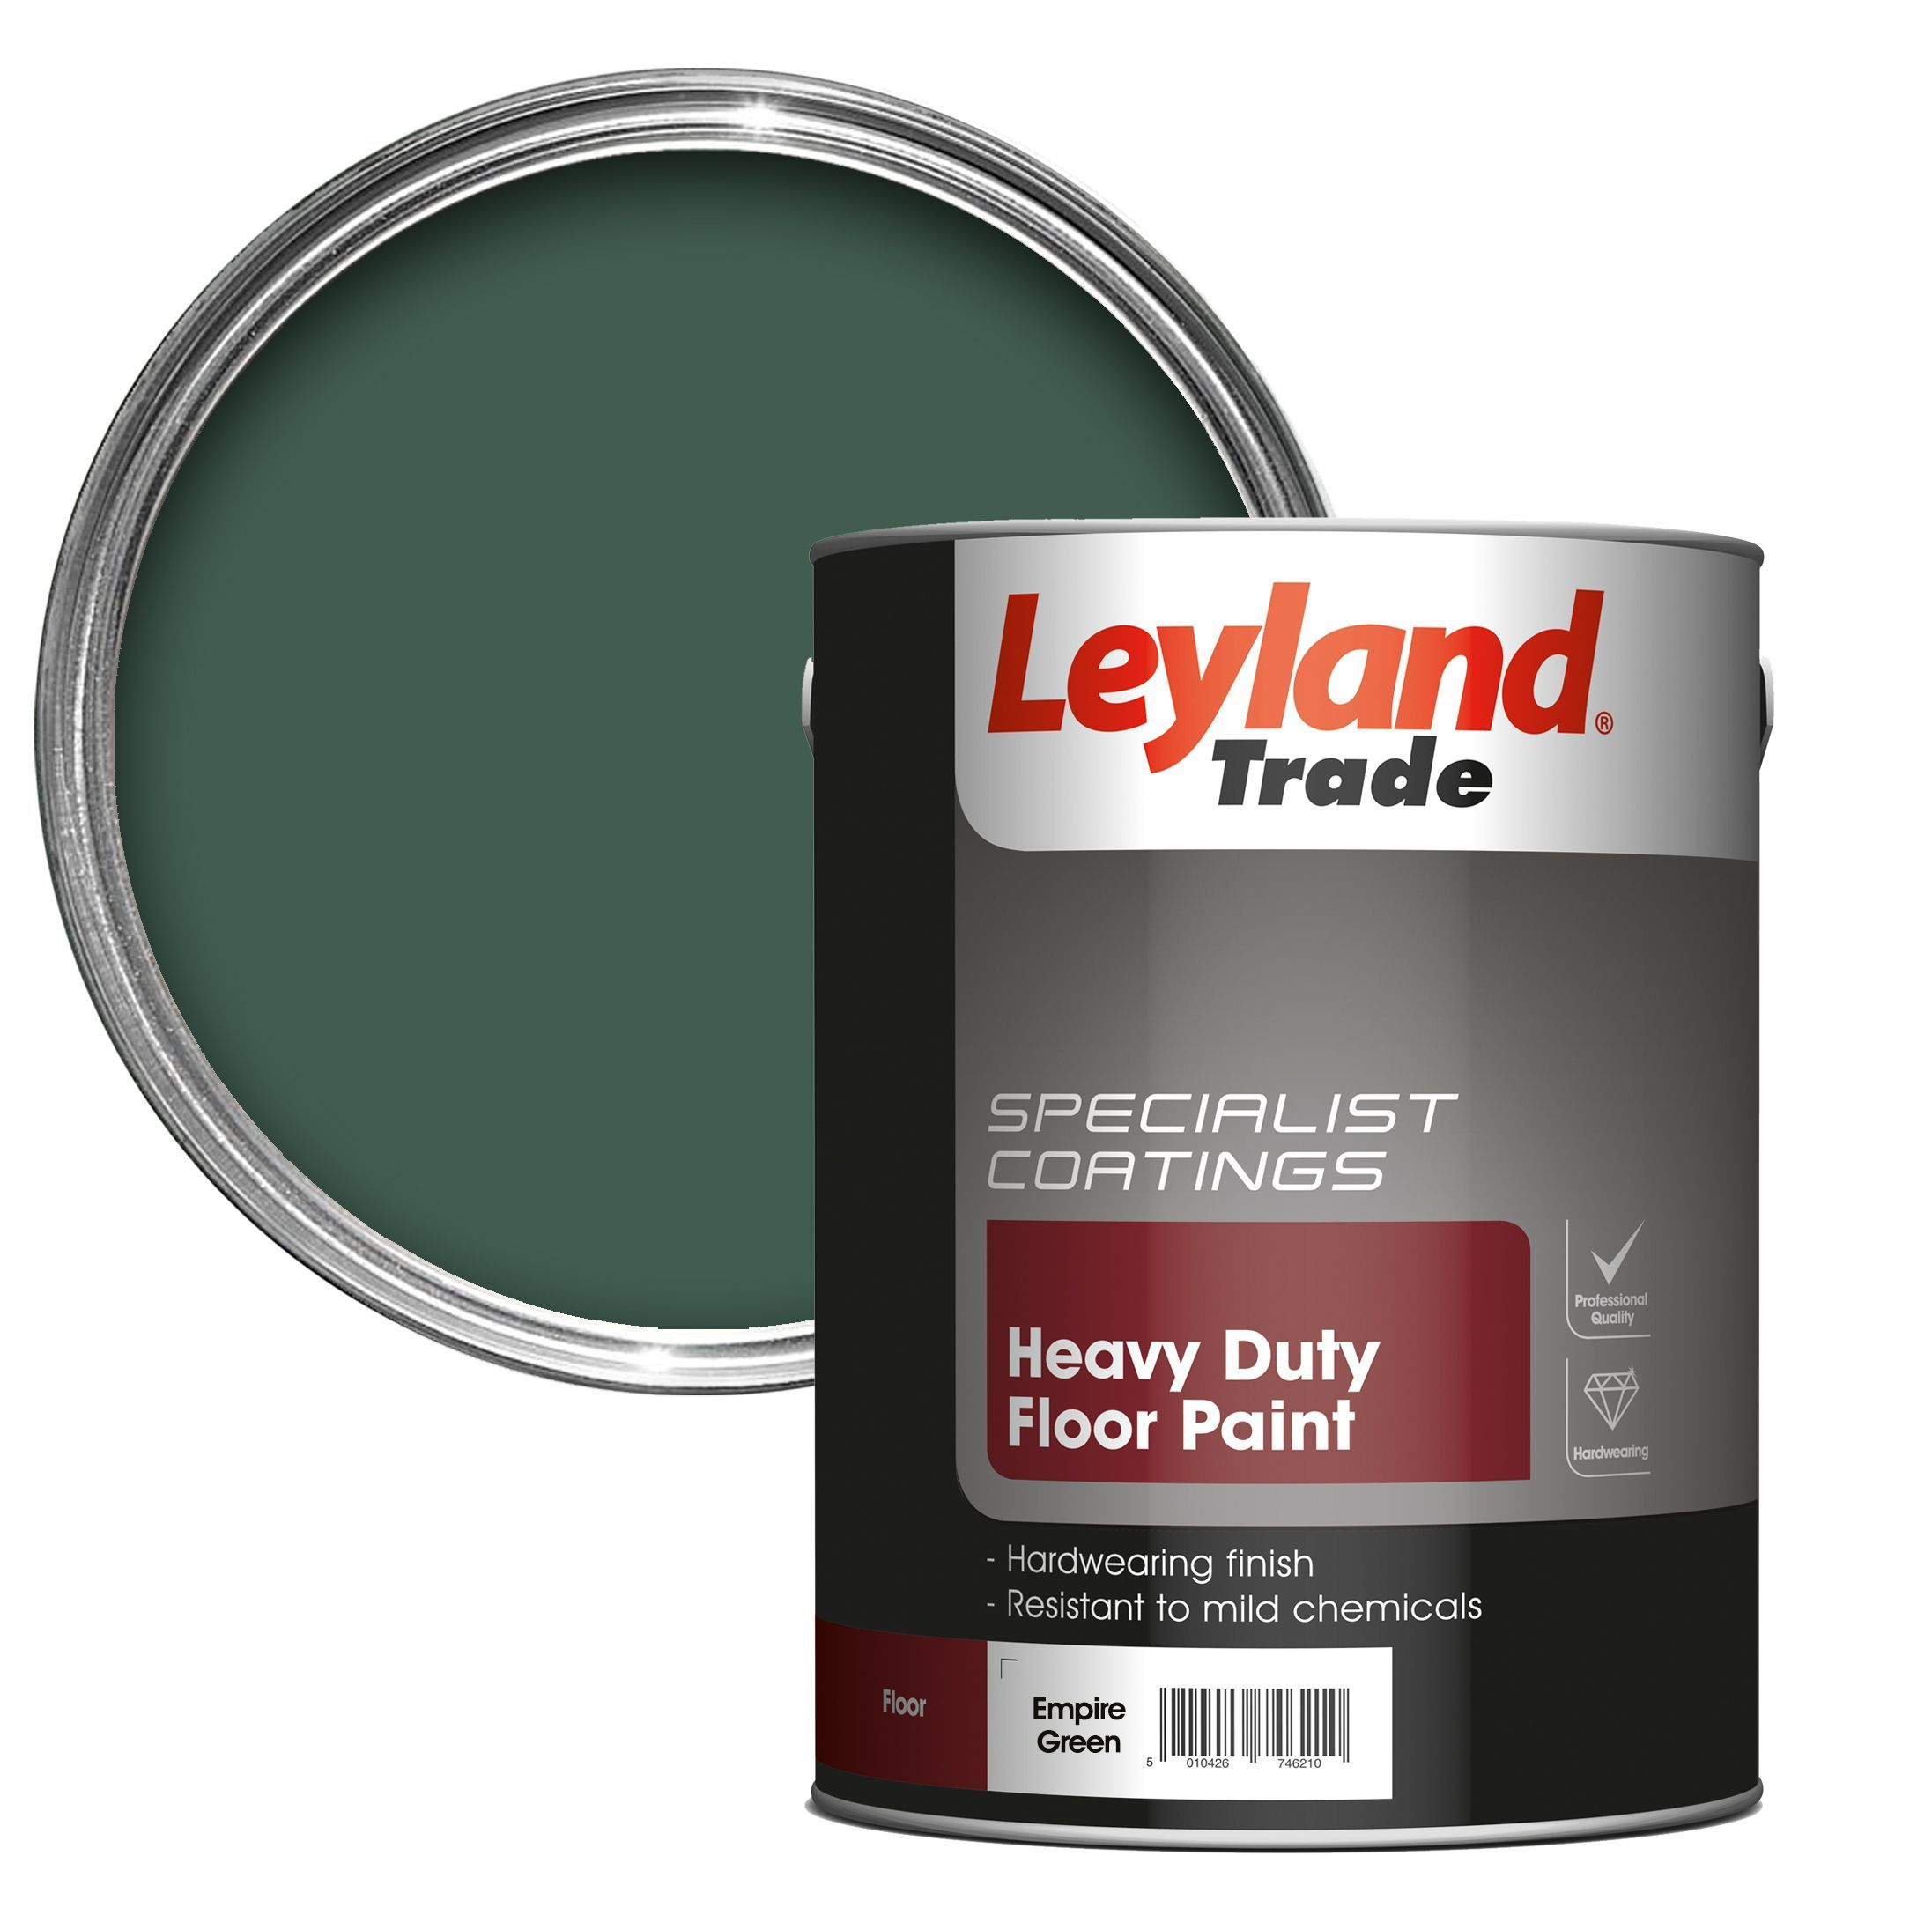 Empire Custom Flooring Inc: Leyland Trade Empire Green Satin Floor & Tile Paint